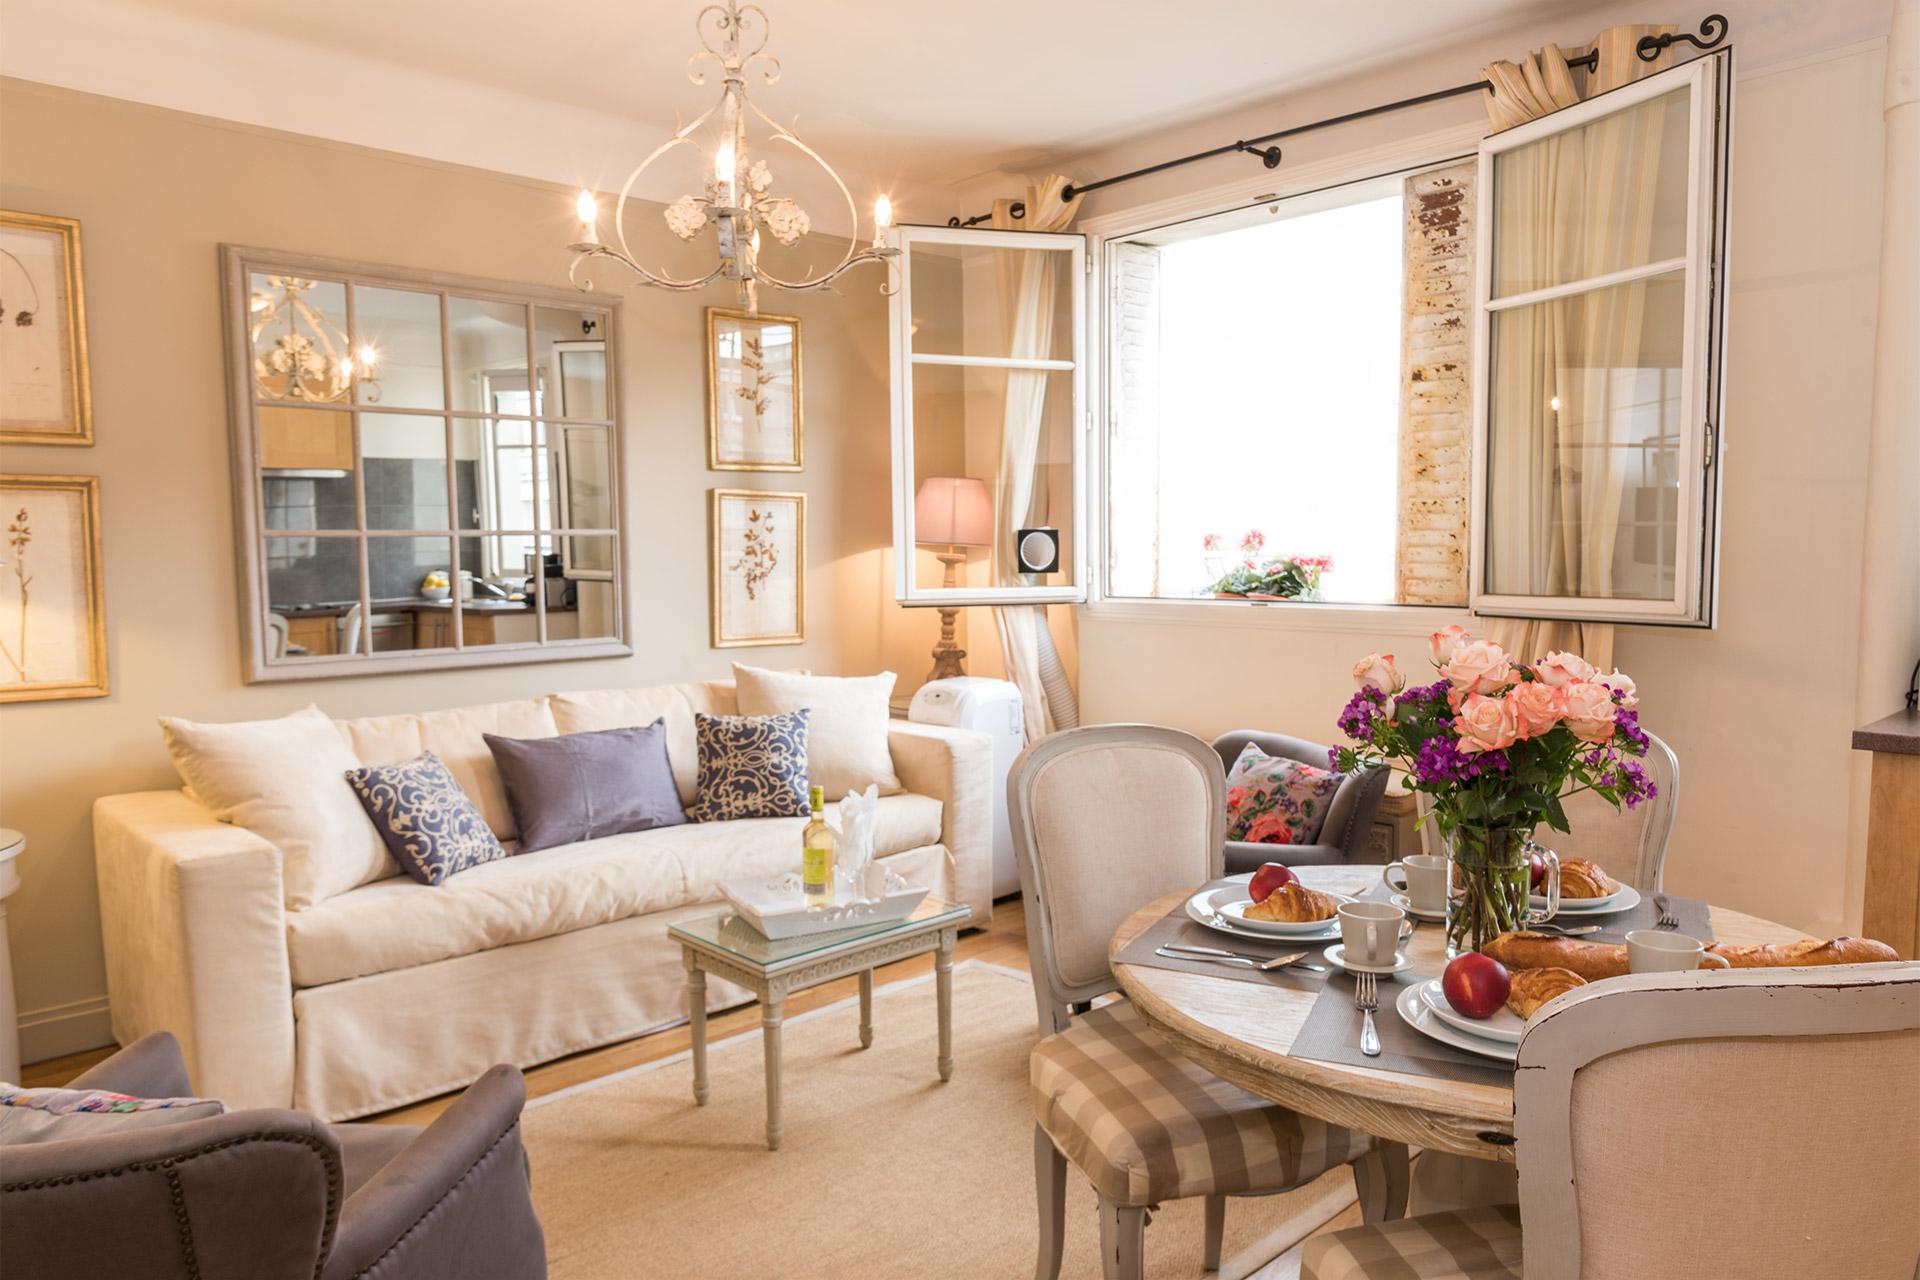 Book 1 Bedroom Furnished Paris Apartment Rental Perfect